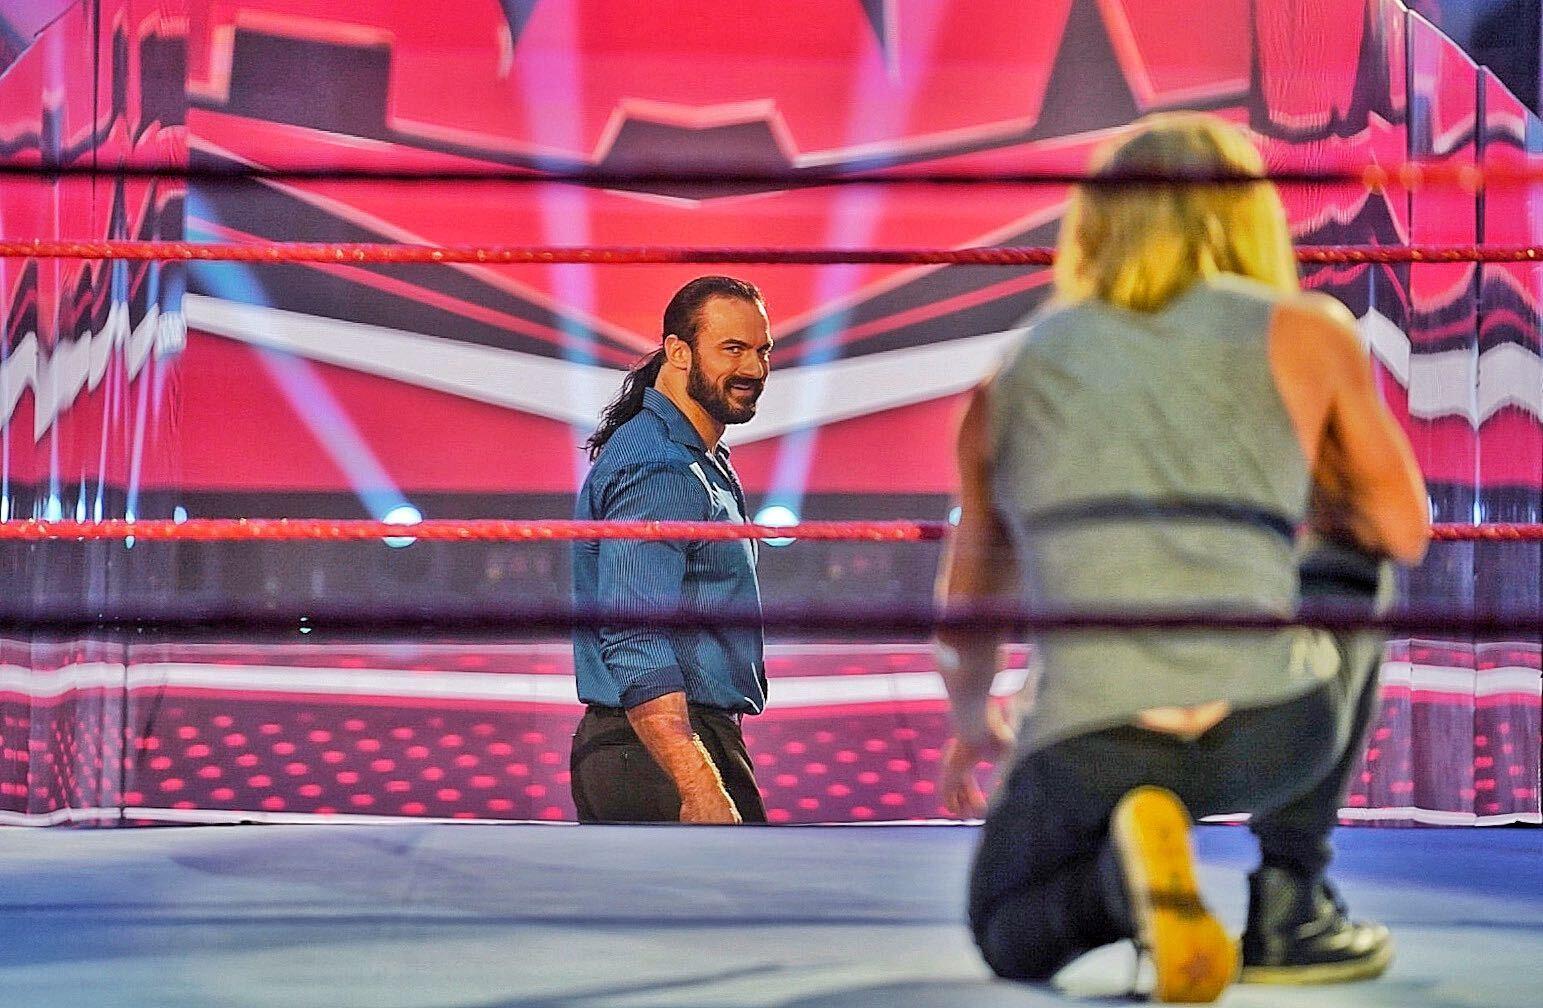 WWE Raw: Sasha Banks Vs Asuka & McIntyre Vs Ziggler Set For Next Week 2